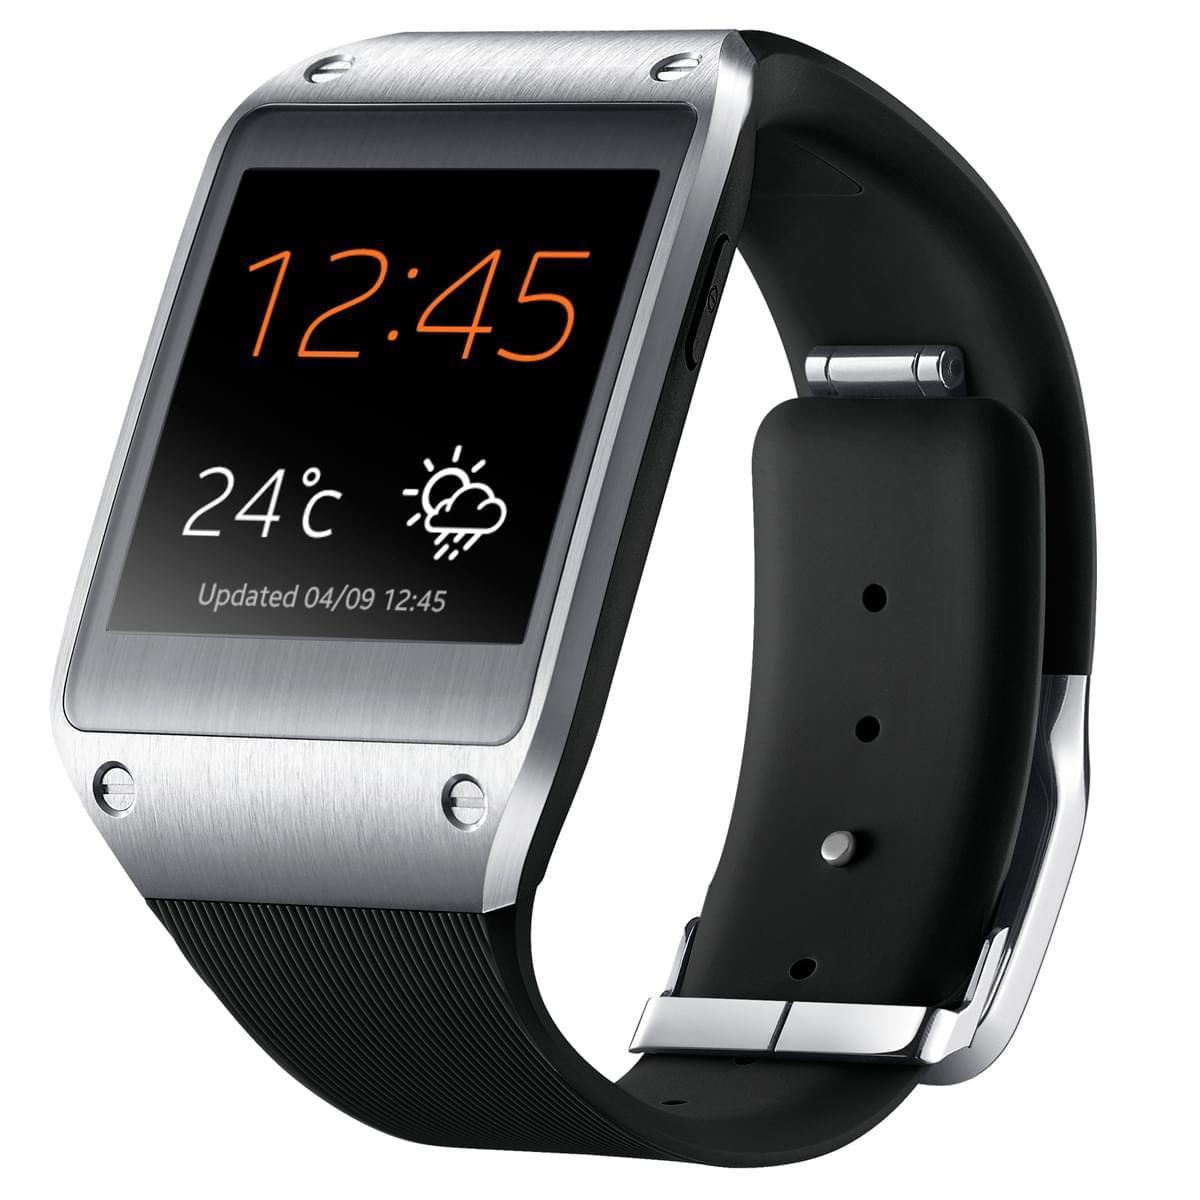 Samsung Galaxy Gear Black (SM-V7000ZKAXEF) - Achat / Vente Téléphonie sur Cybertek.fr - 0